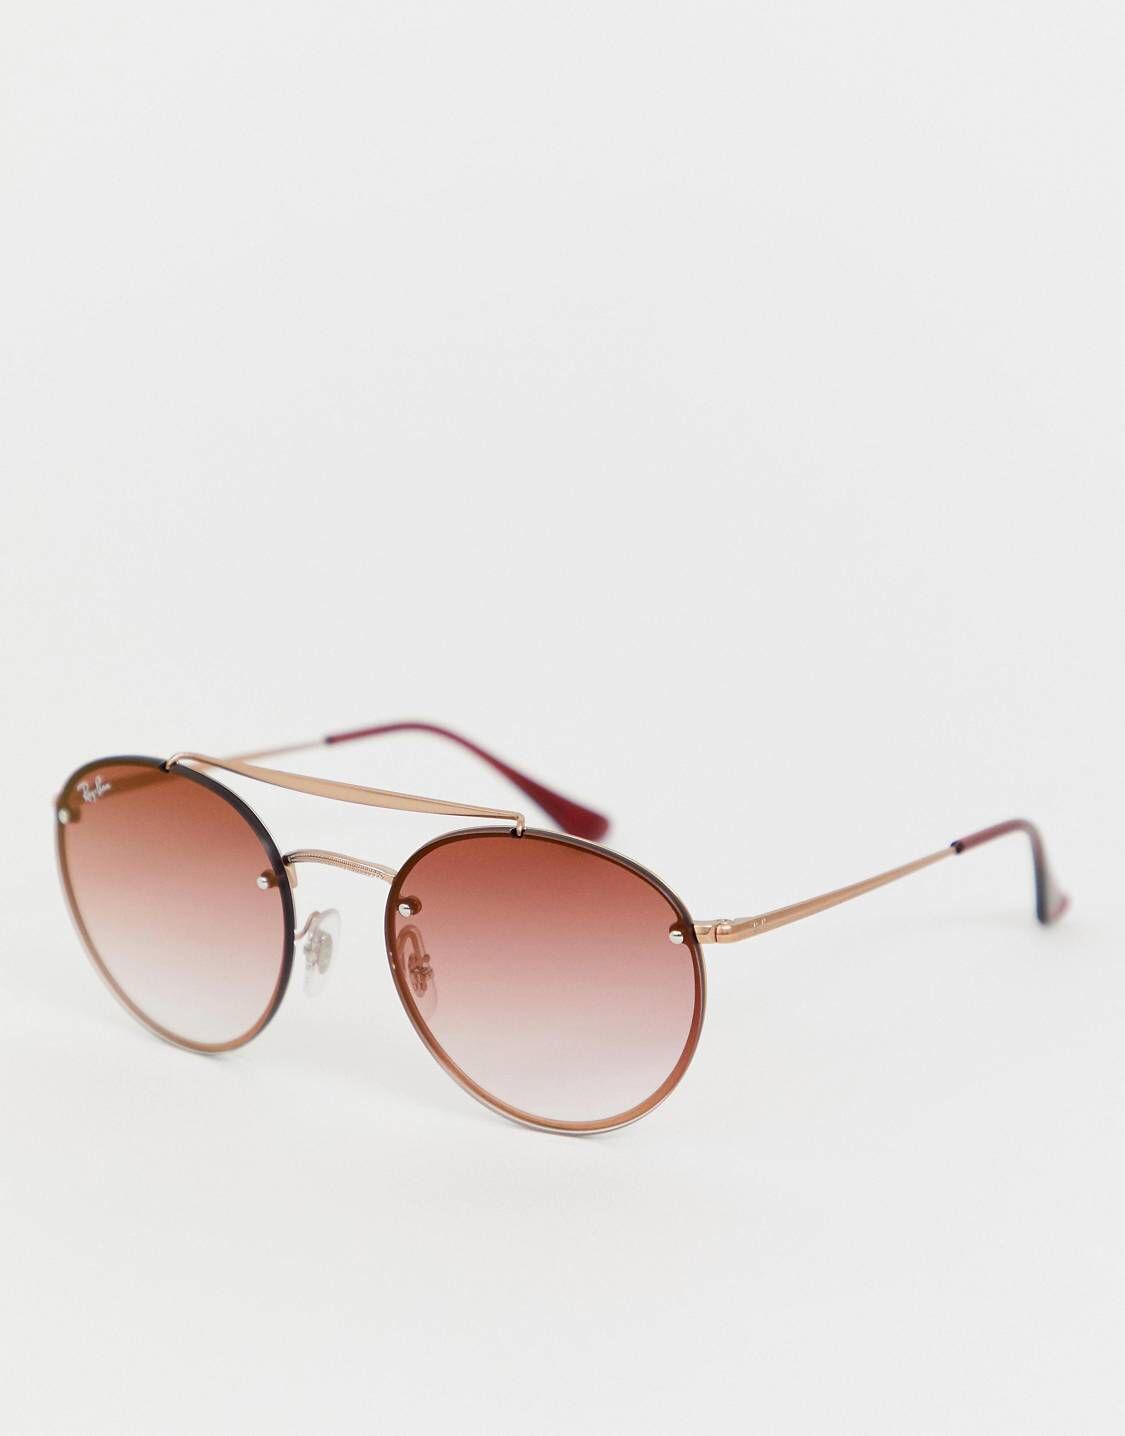 93dfd96469 Ray-Ban 0RB3614N Blaze round sunglasses i 2019